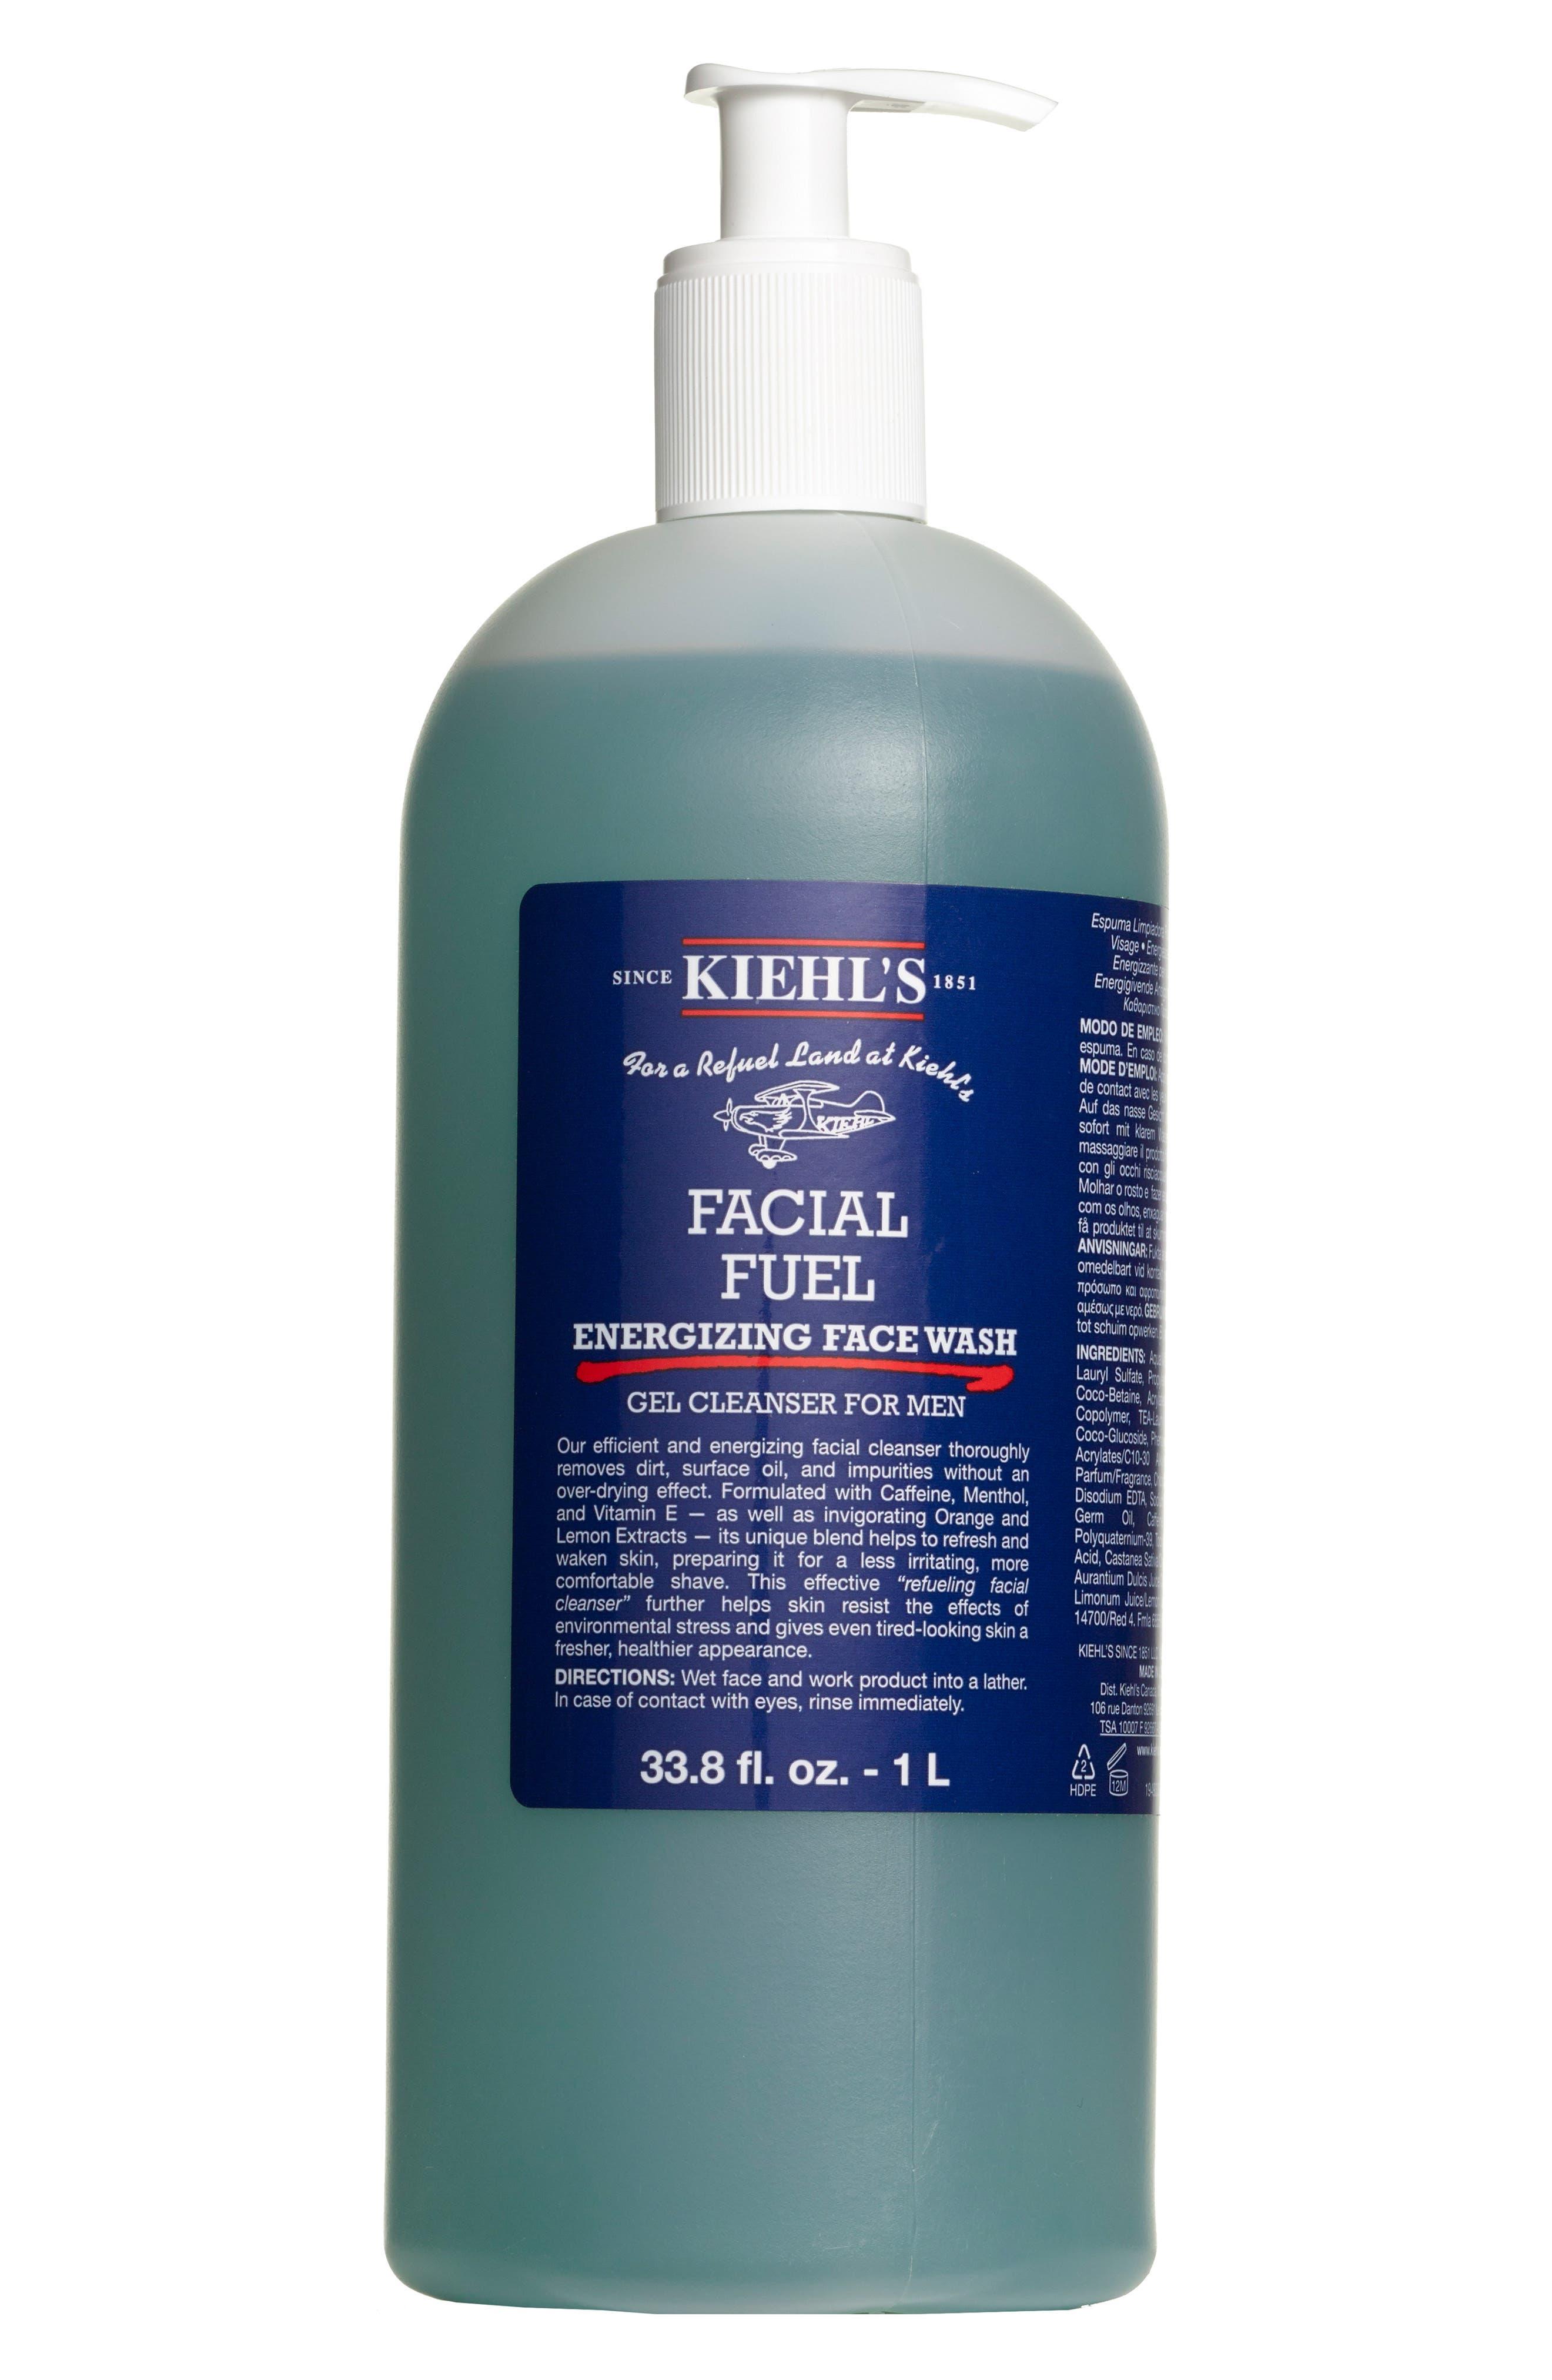 1851 Facial Fuel Energizing Face Wash